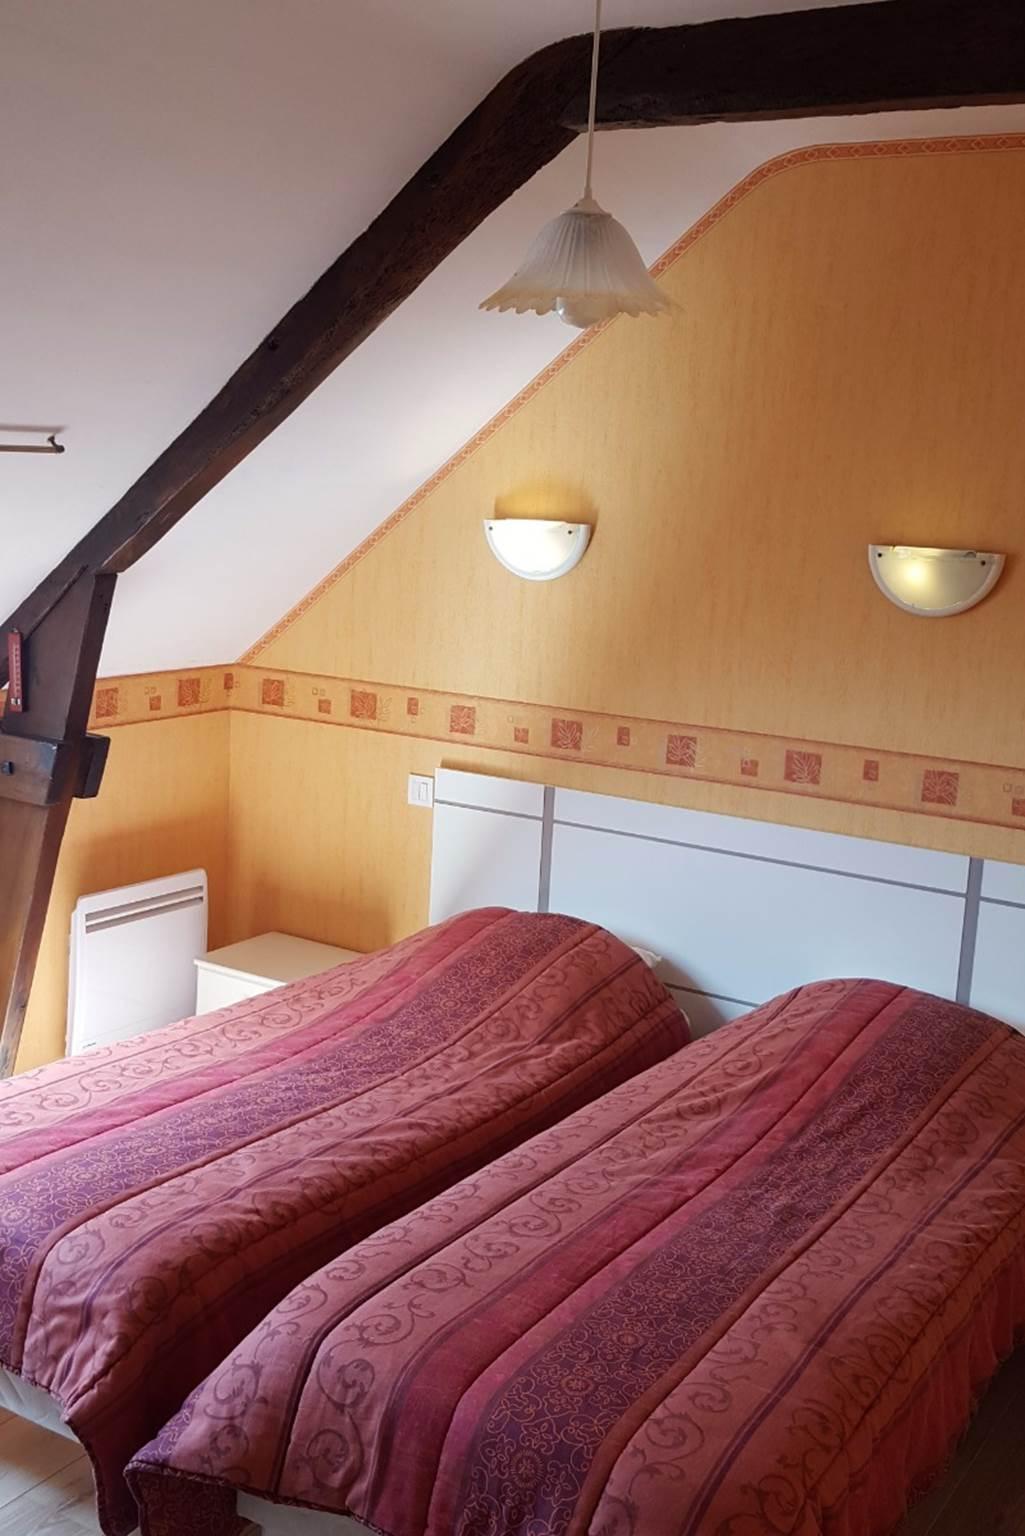 La Léguinais – Saint-Dolay – Damgan La Roche Bernard Tourisme